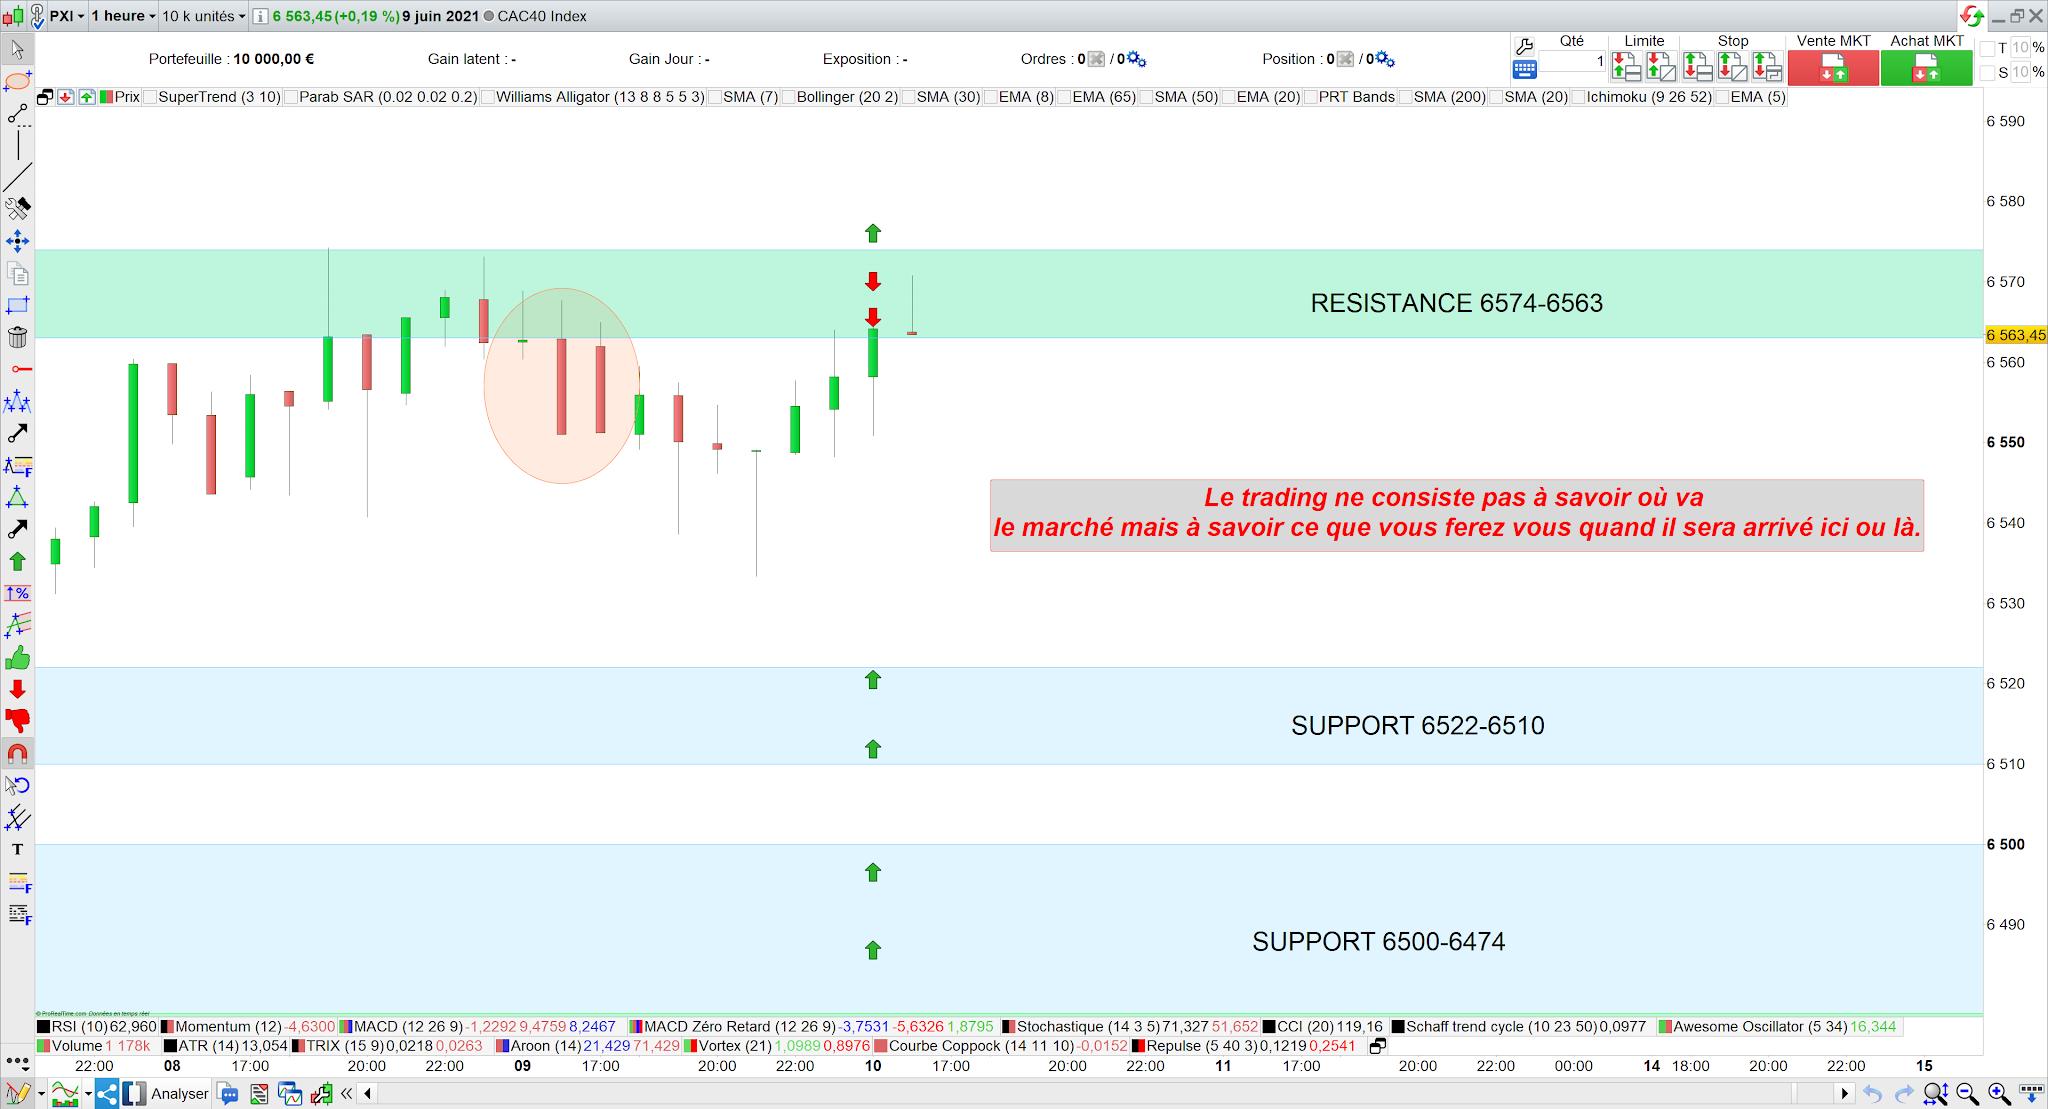 Bilan trading cac40 10 juin 21